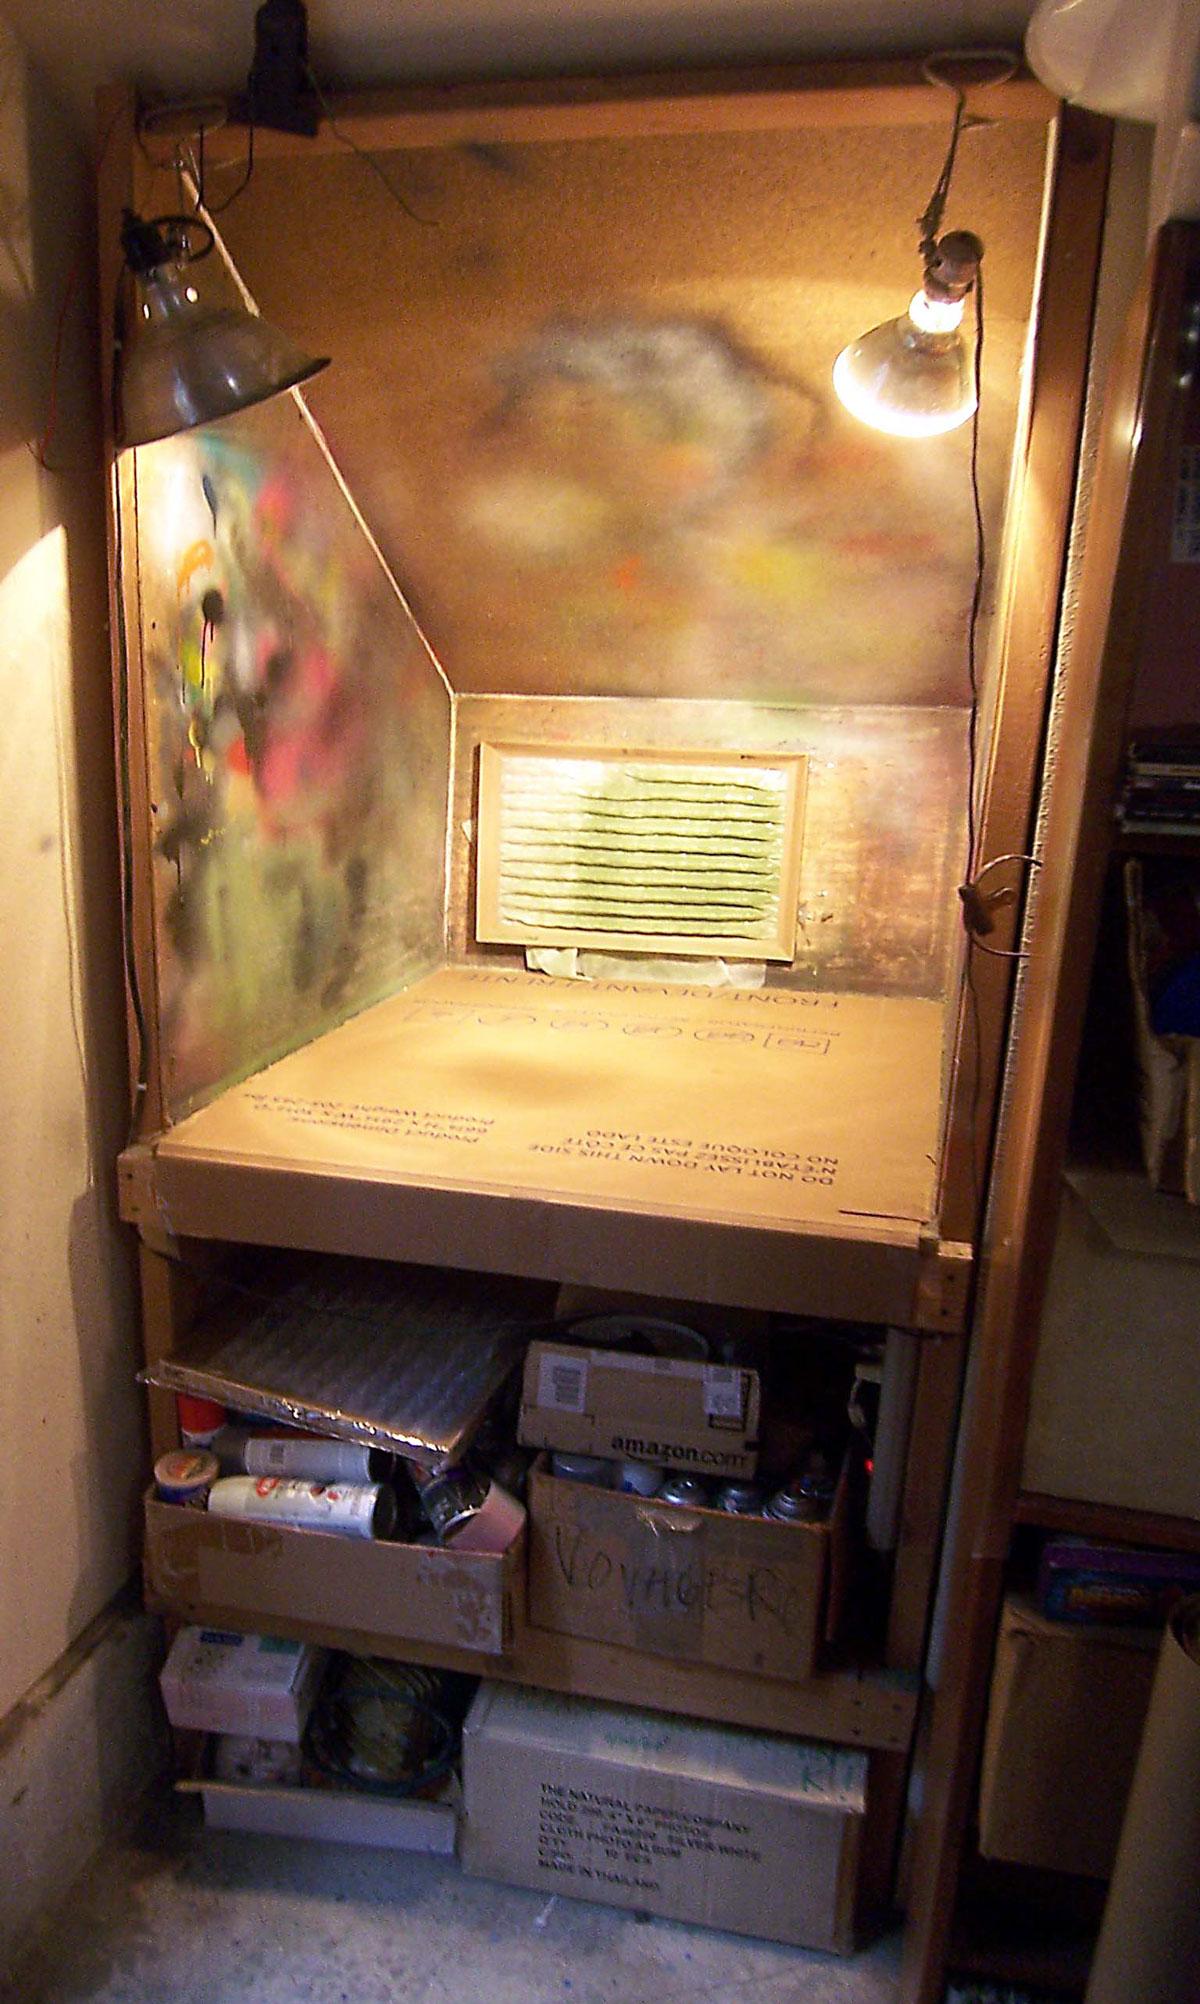 Toy Inventor S Notebook Stairwell Spray Booth Make